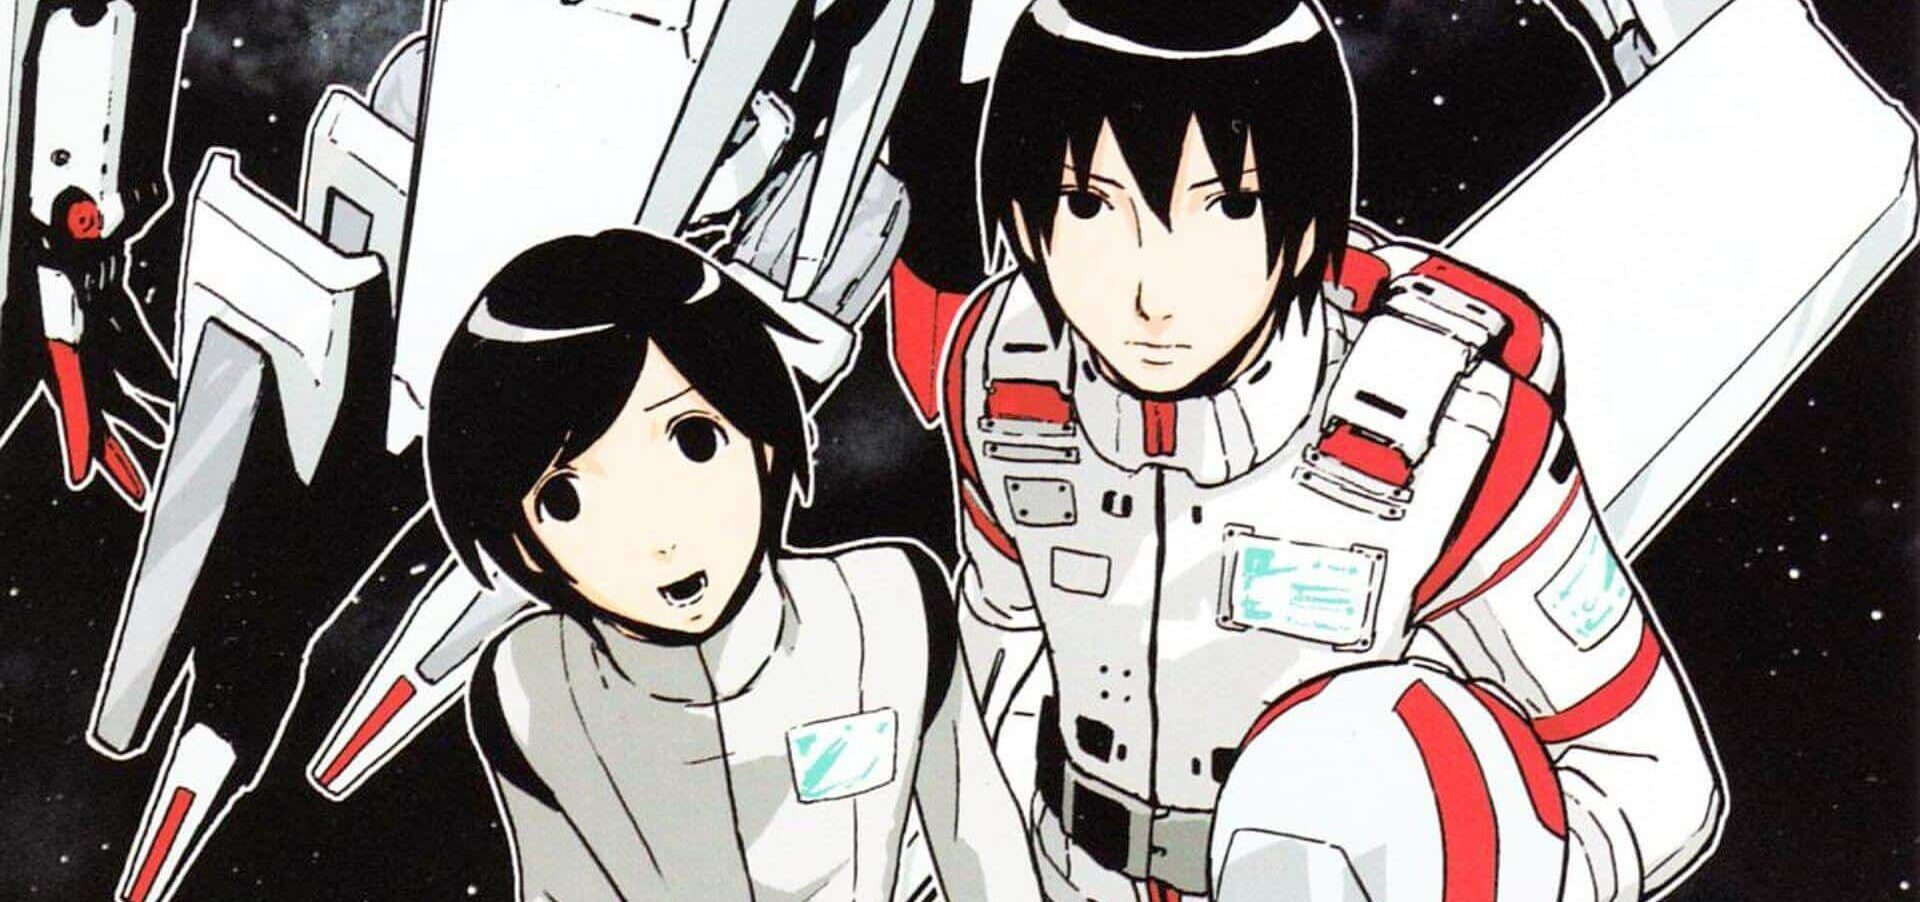 Knights of Sidonia - os protagonistas Izana e Nagate lado a lado